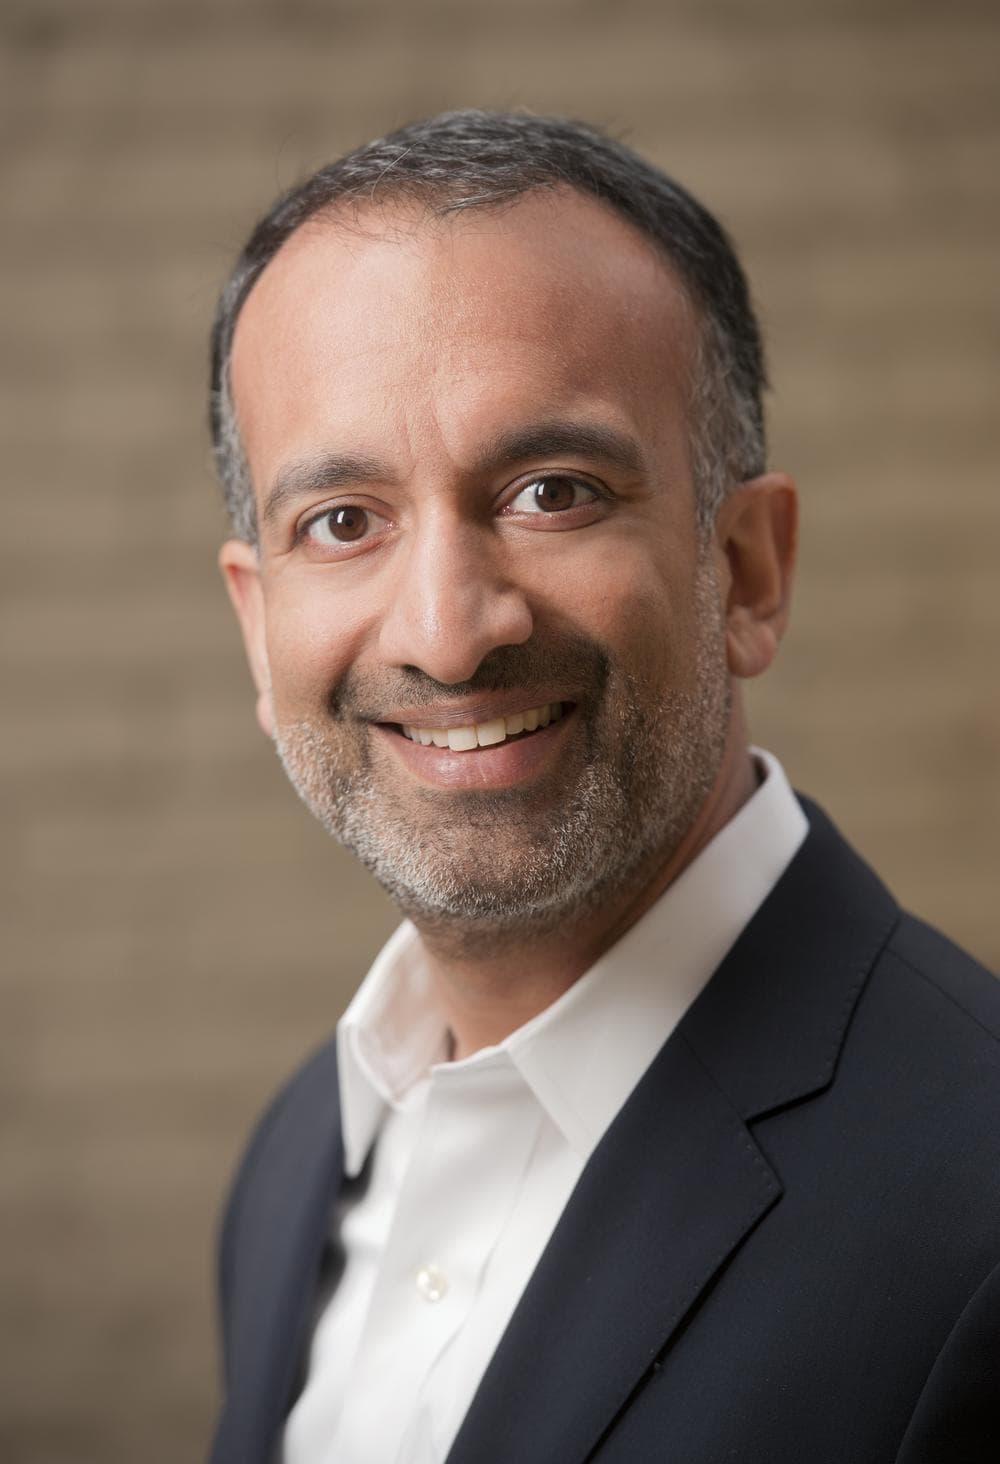 Rajiv Chandrasekaran in Washington, DC. (Photo by Bill O'Leary/The Washington Post)